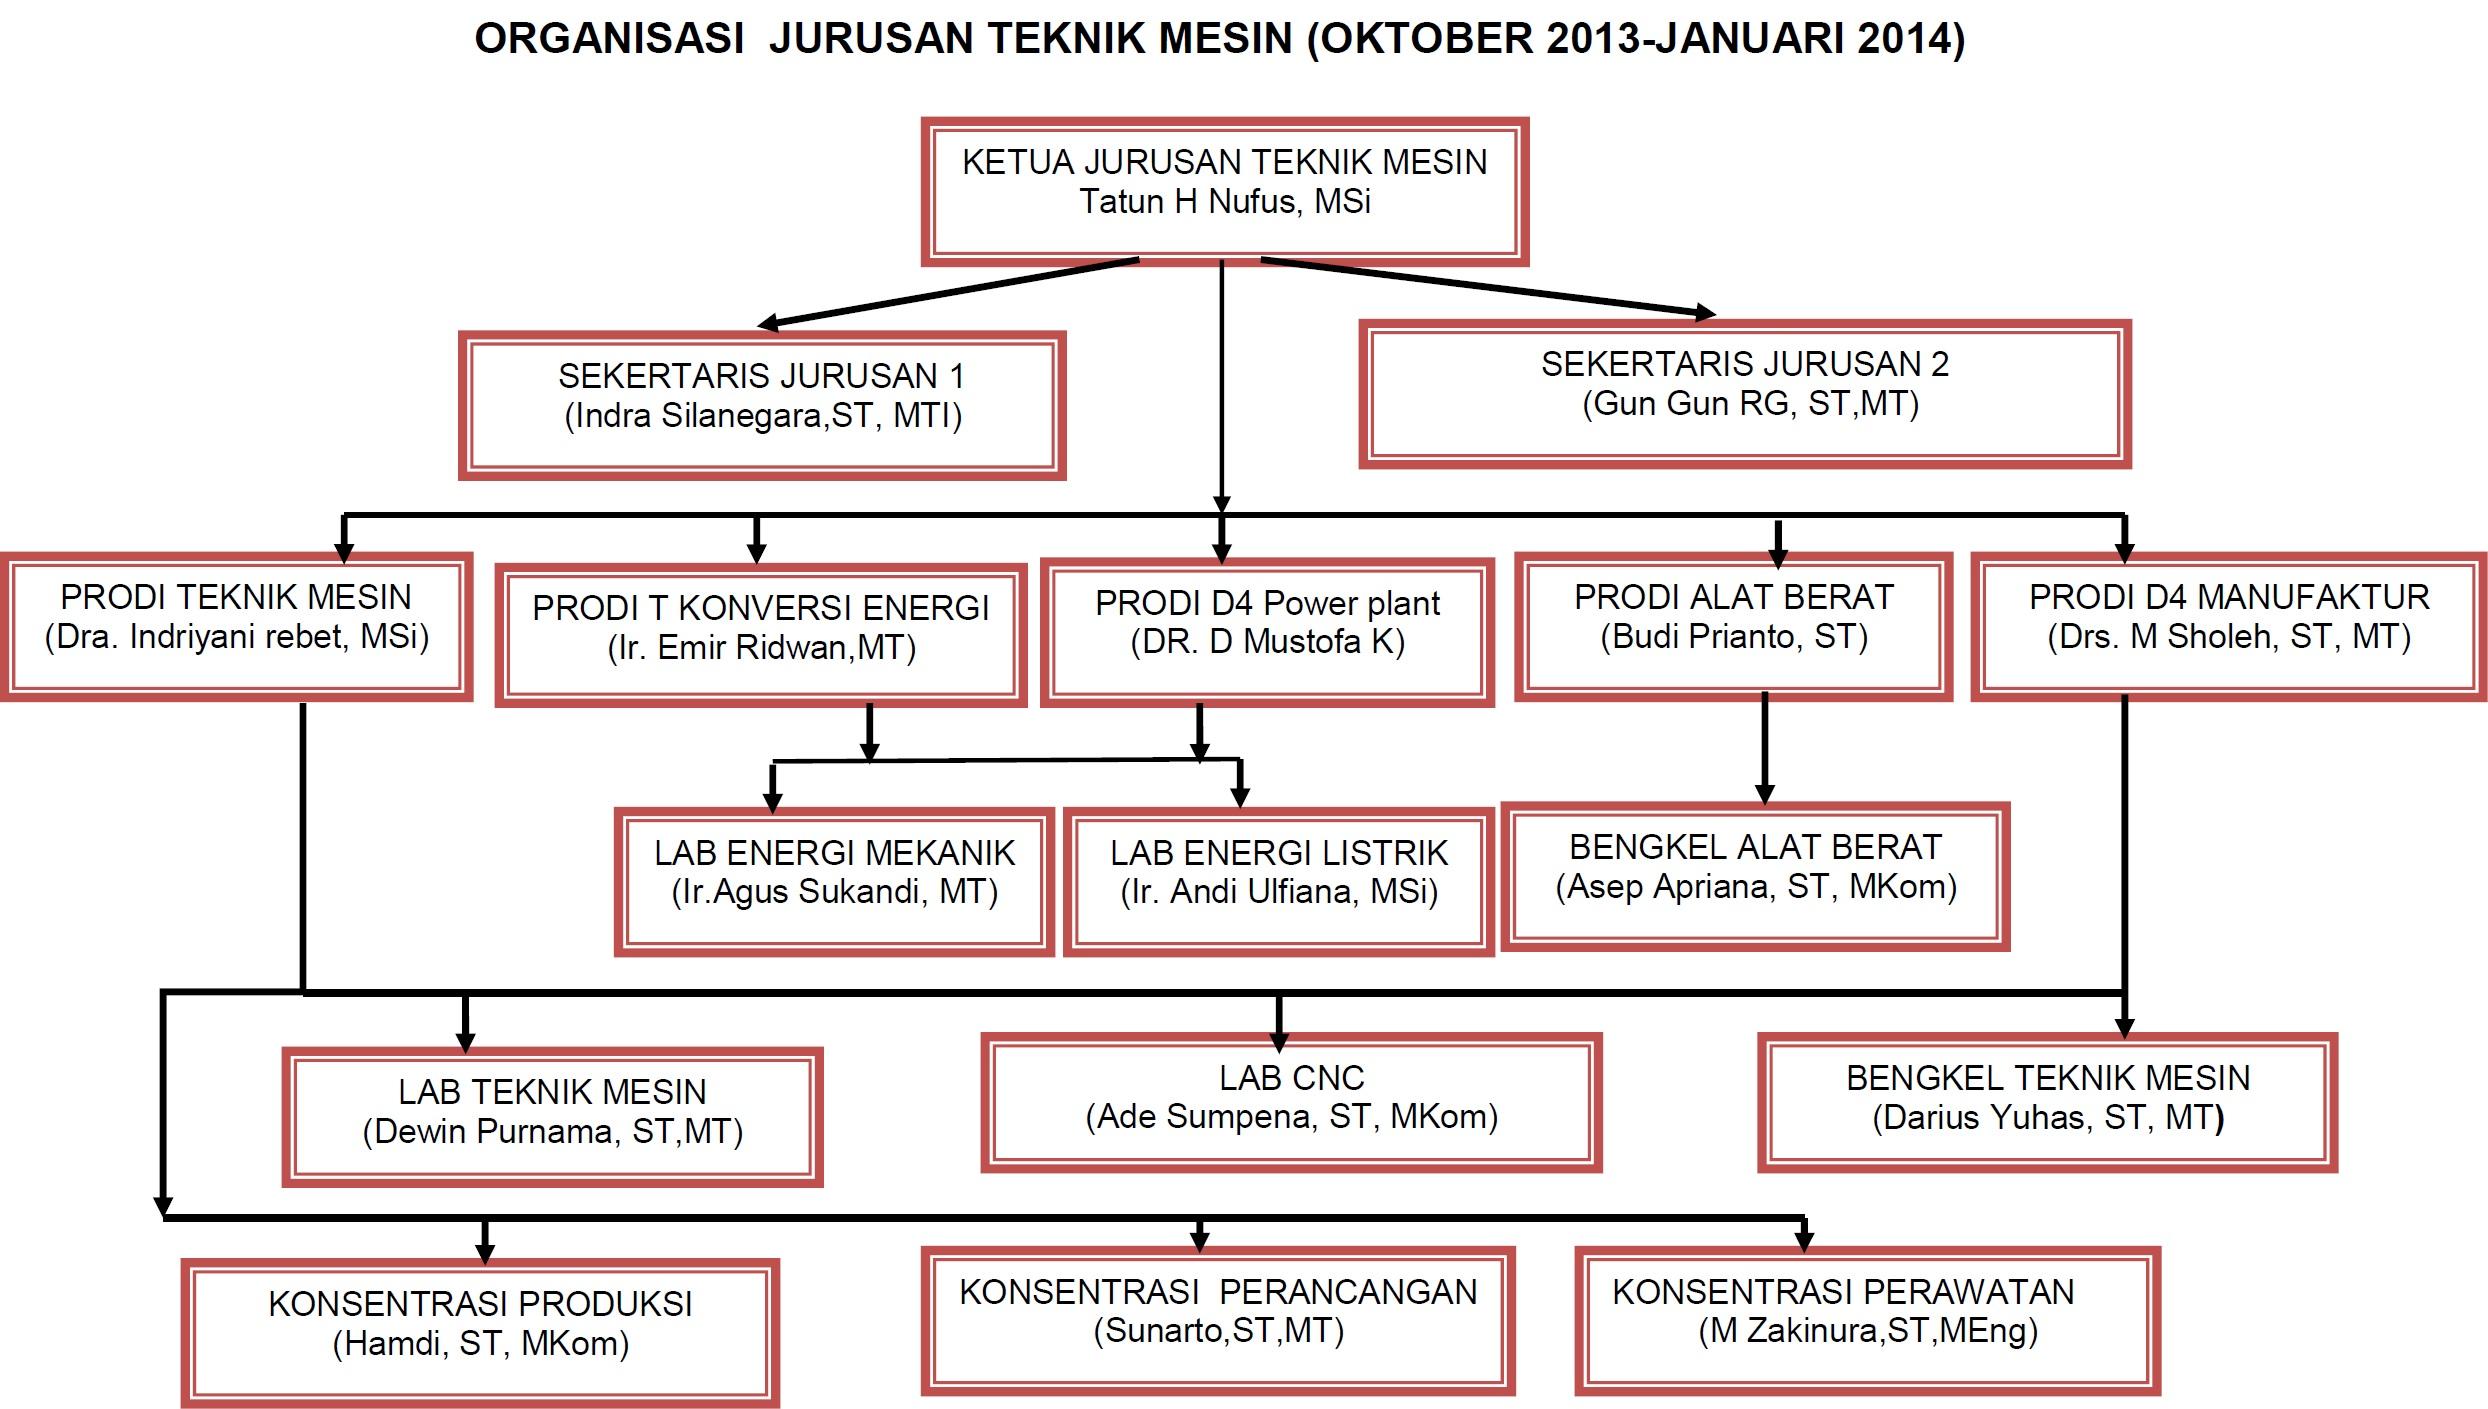 Copyright © 1998-2014 Politeknik Negeri Jakarta. All Right Reserved